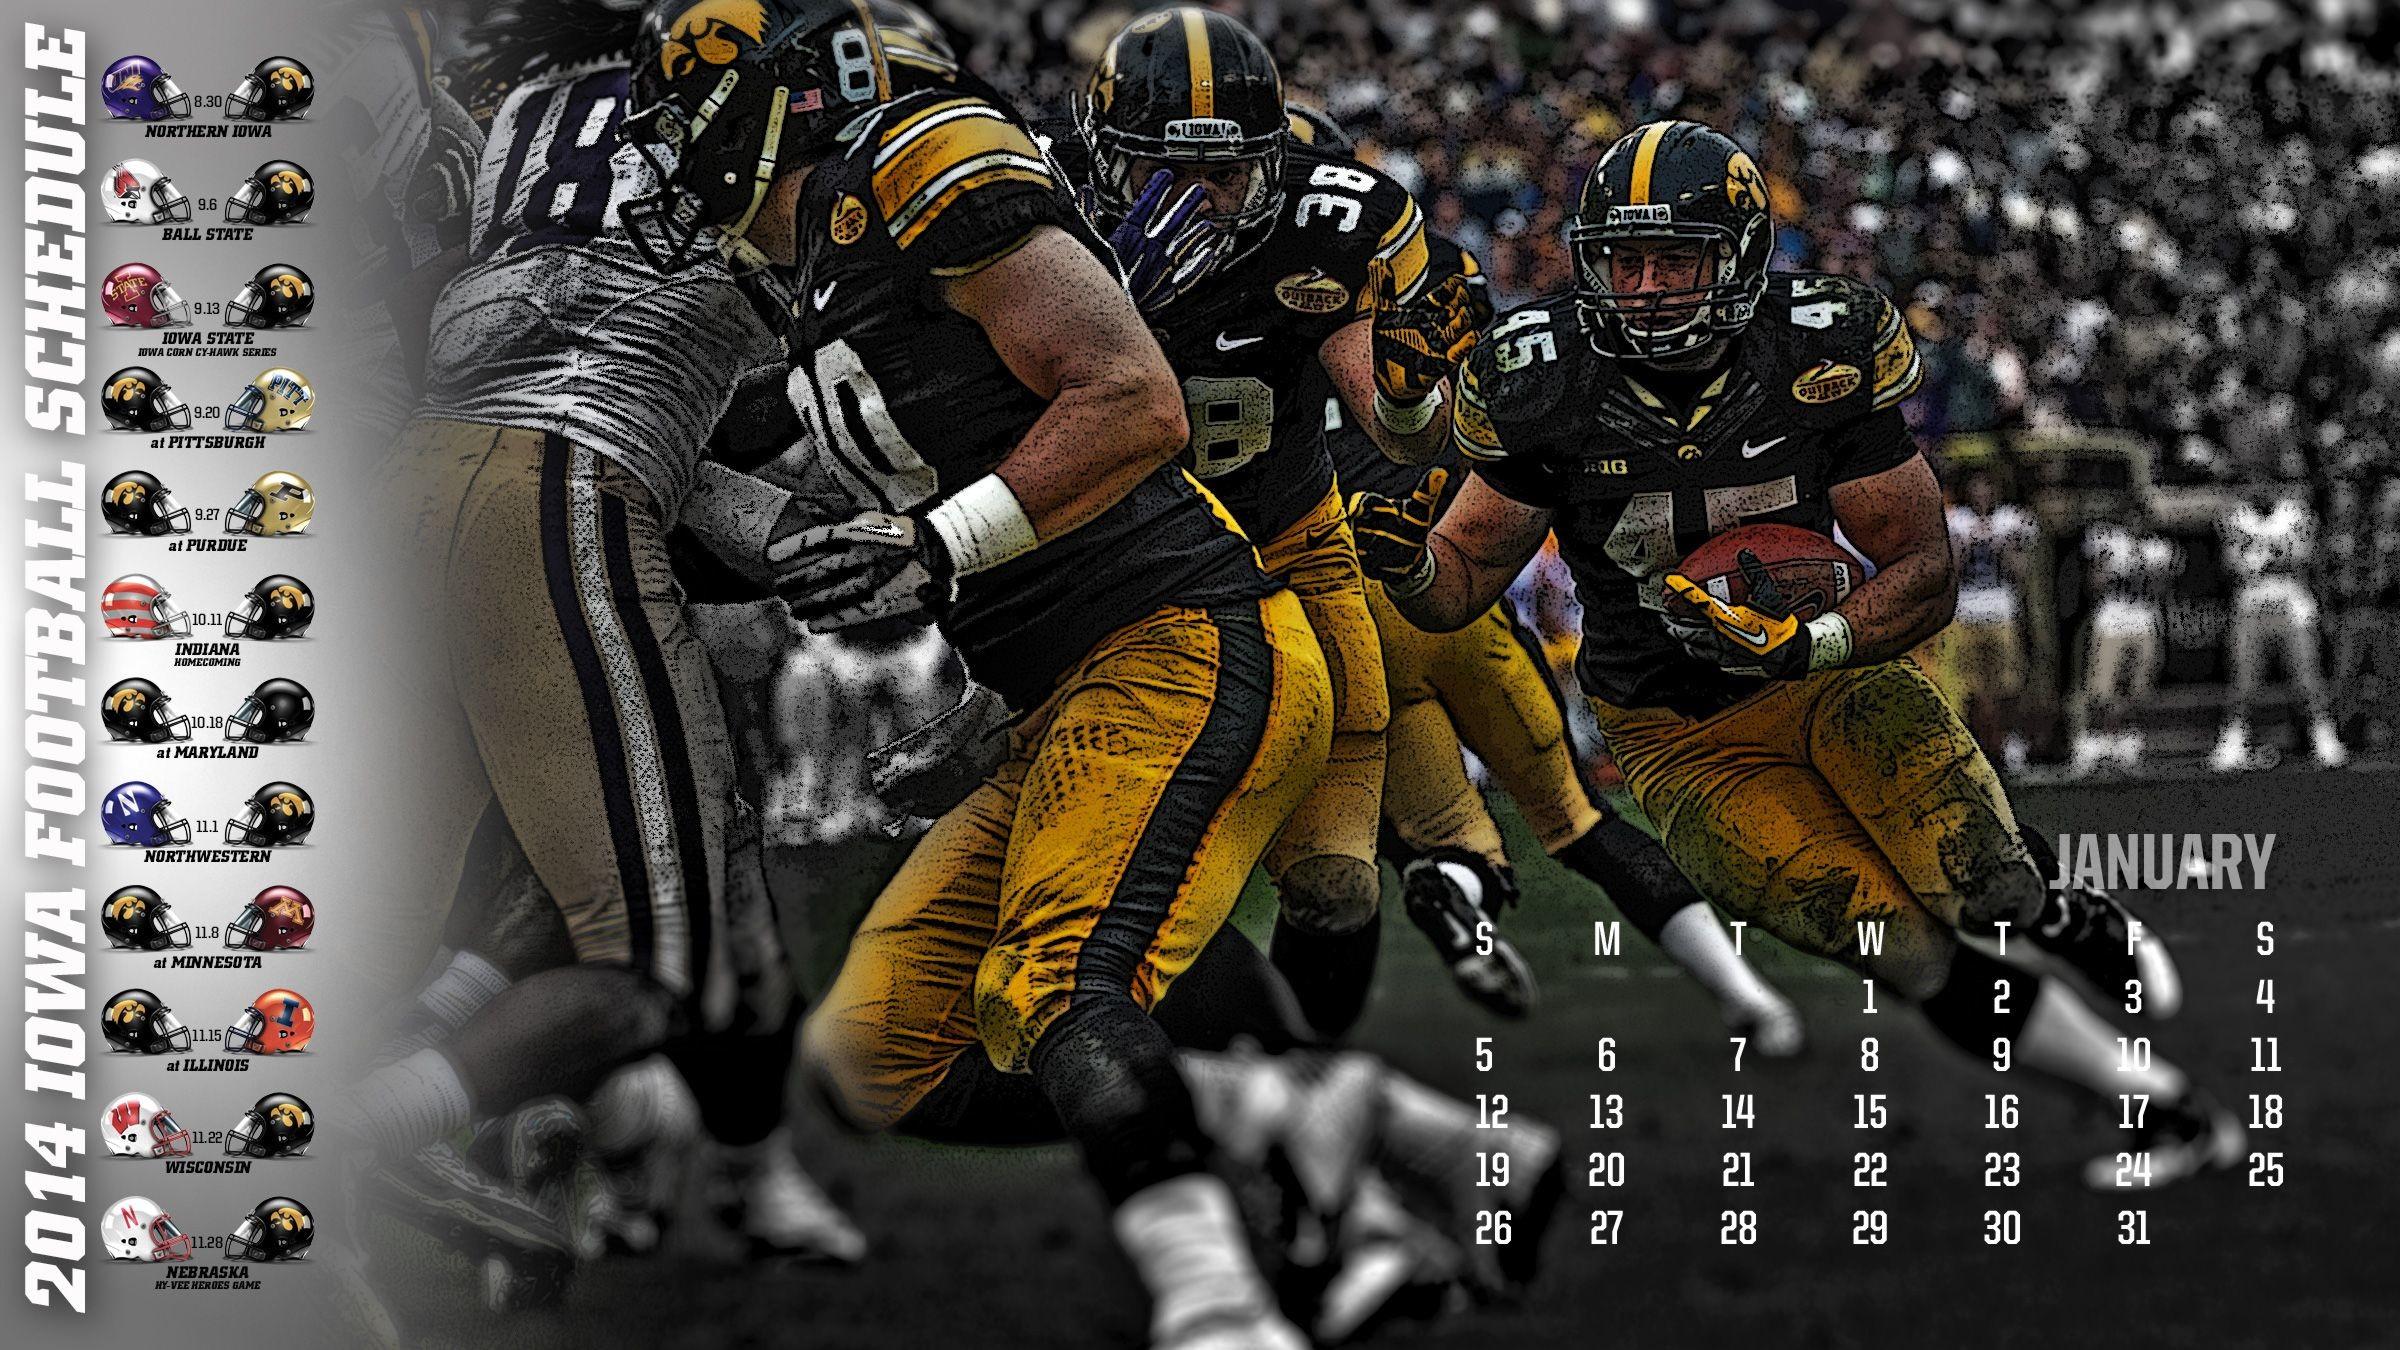 Image Gallery For Hawkeye Football Wallpaper Iowa Hawkeye Football .